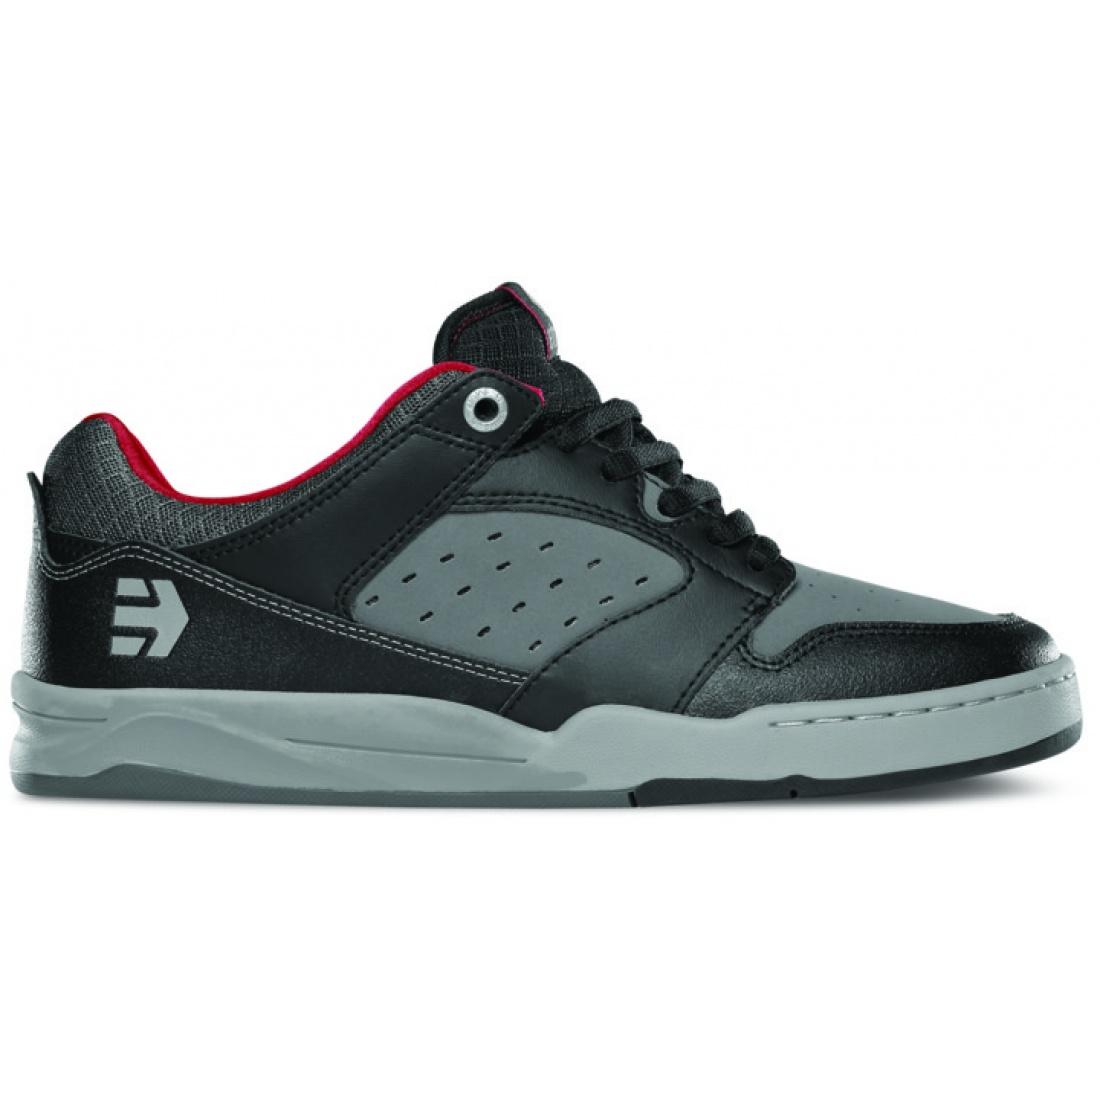 ETN-Drifter Black/Grey Shoes